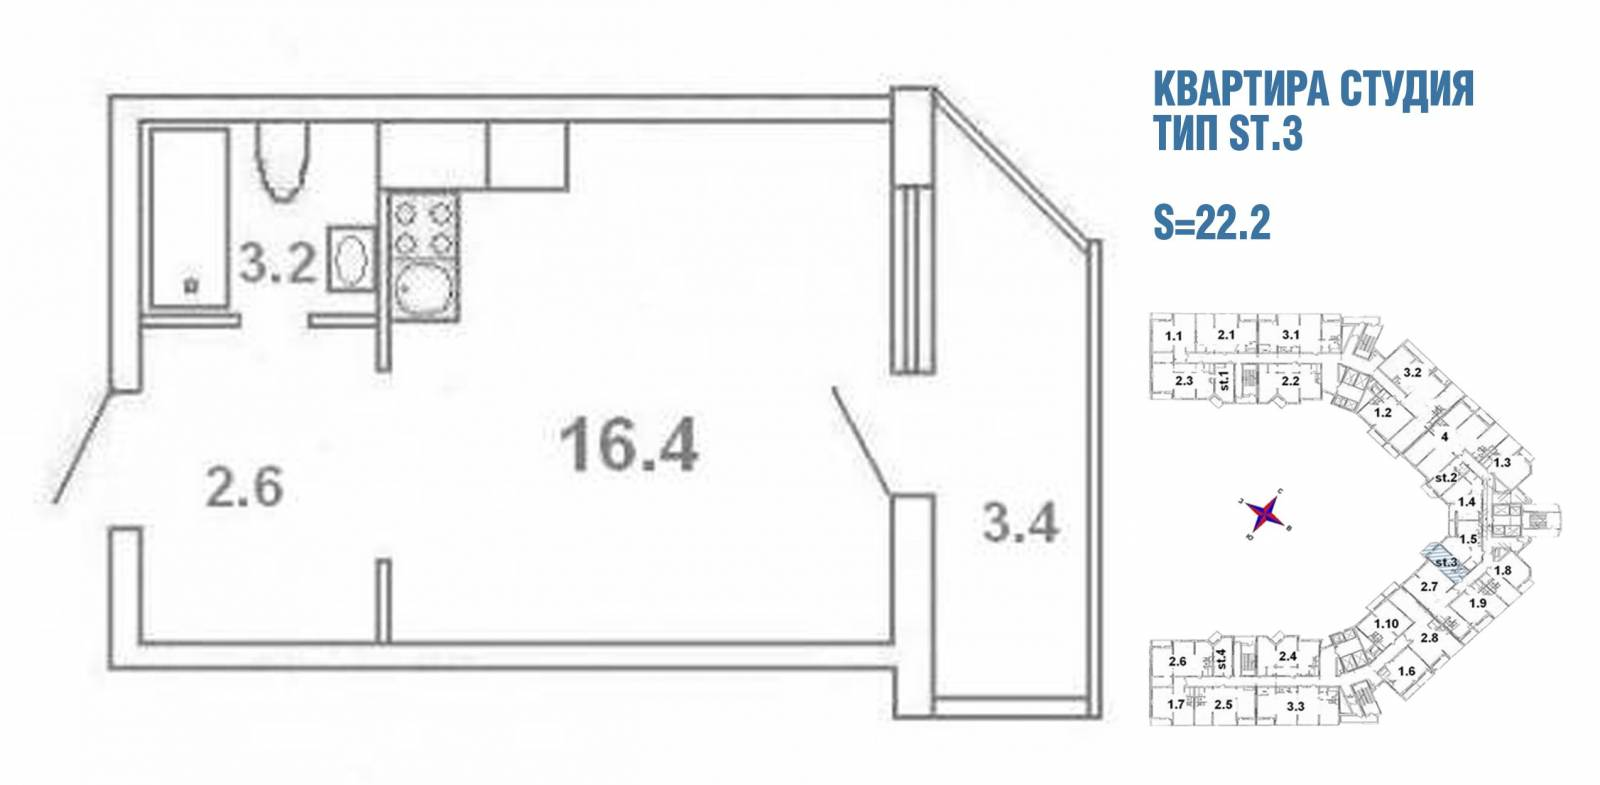 Квартира студия тип st.3 - 22,2 кв.м.